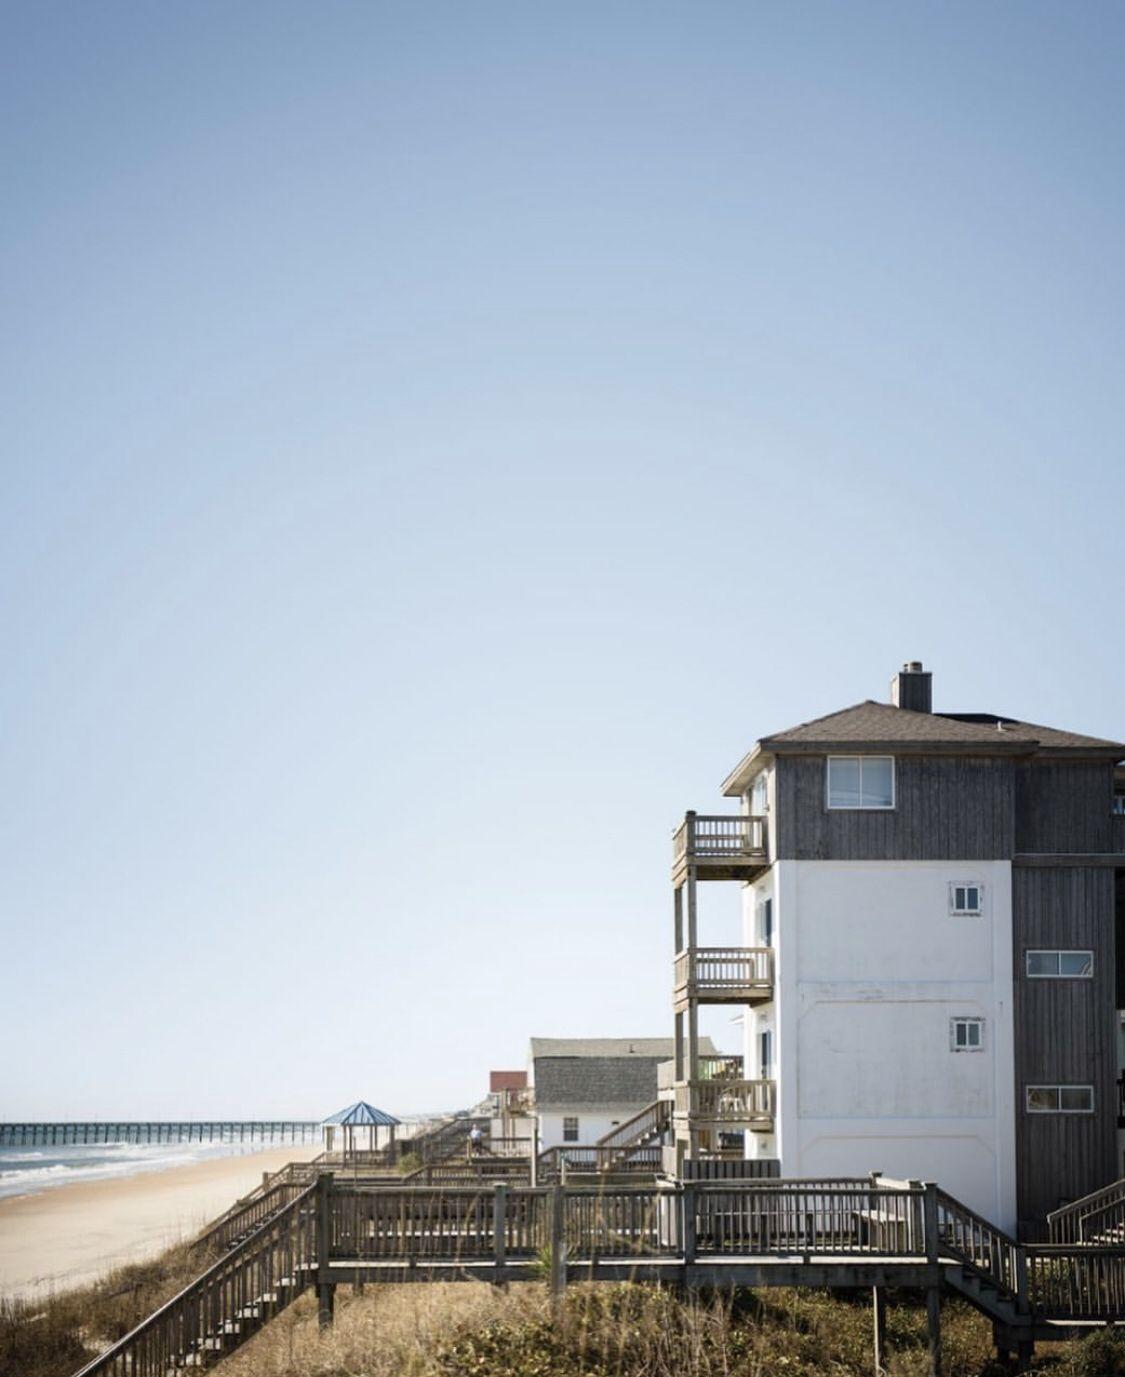 Topsail Beach📍 Coastal homes for sale in Topsail, NC